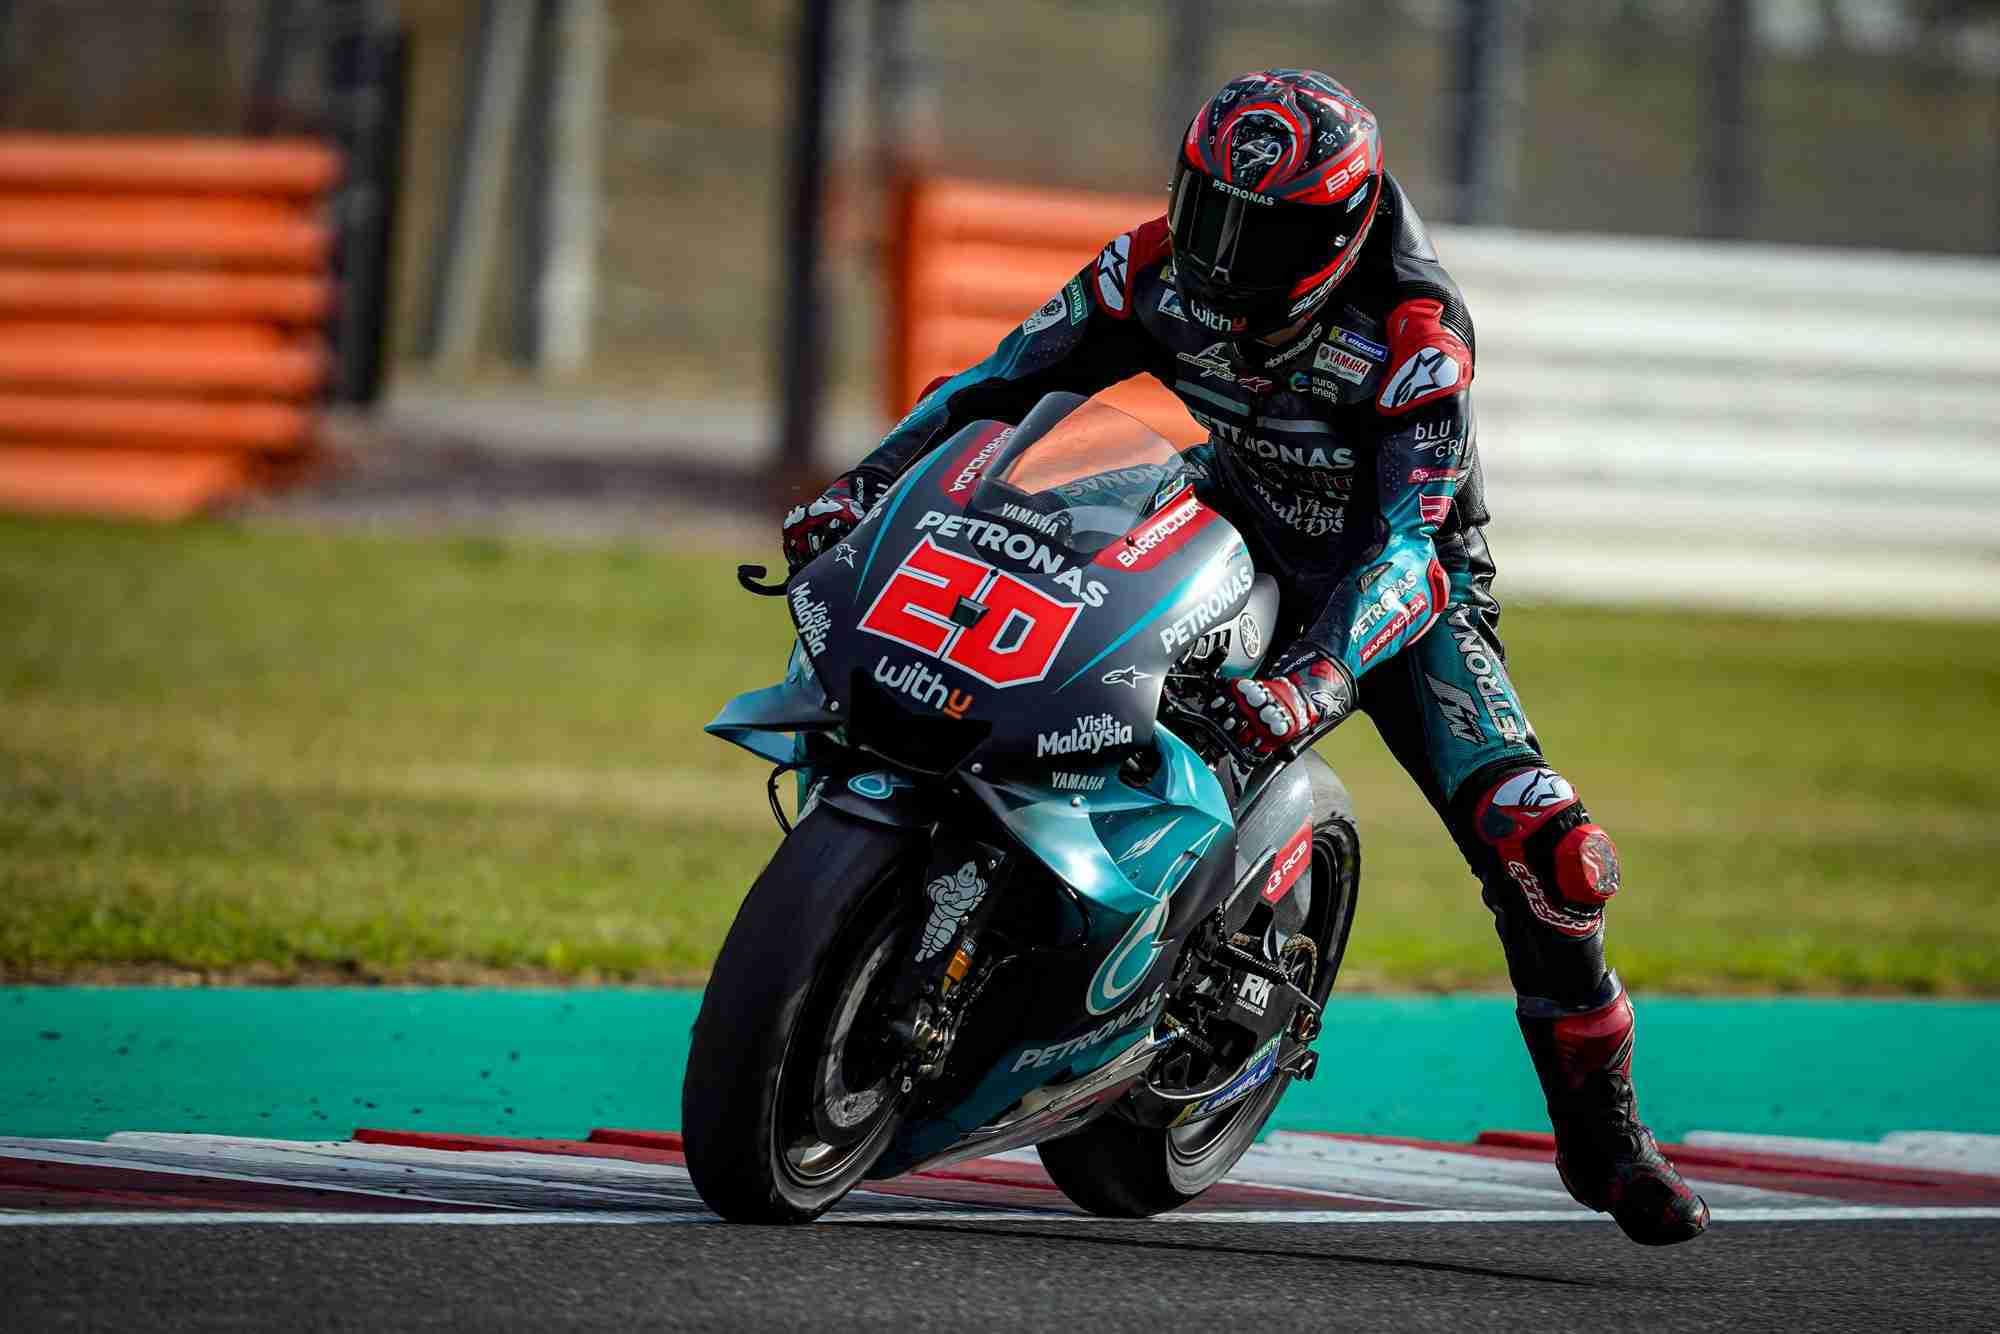 Fabio Quartararo Aragon 2019 Hd Motogp Wallpaper Iamabiker Everything Motorcycle